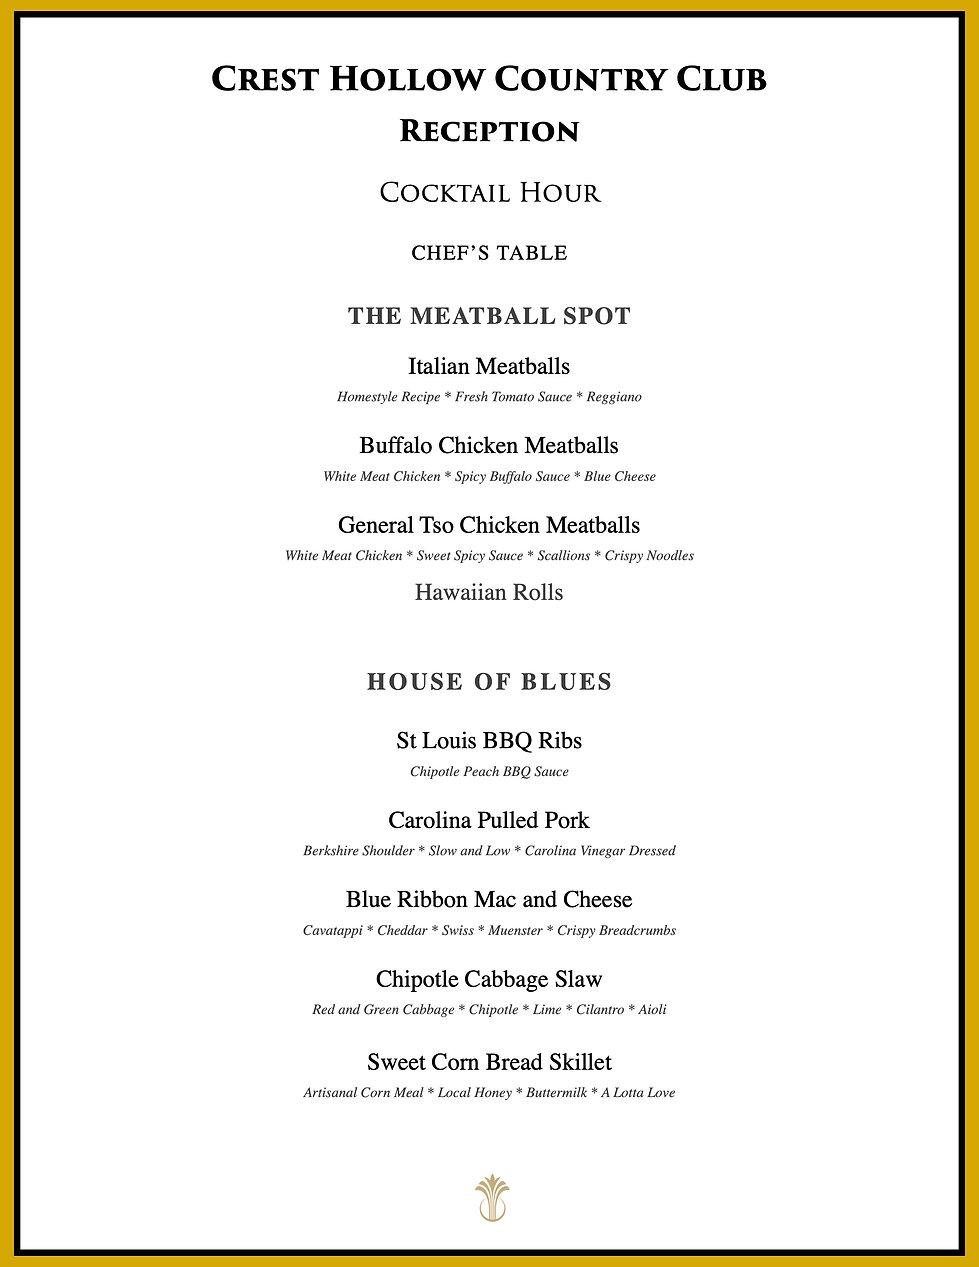 Reception Menu - Page 6.jpg